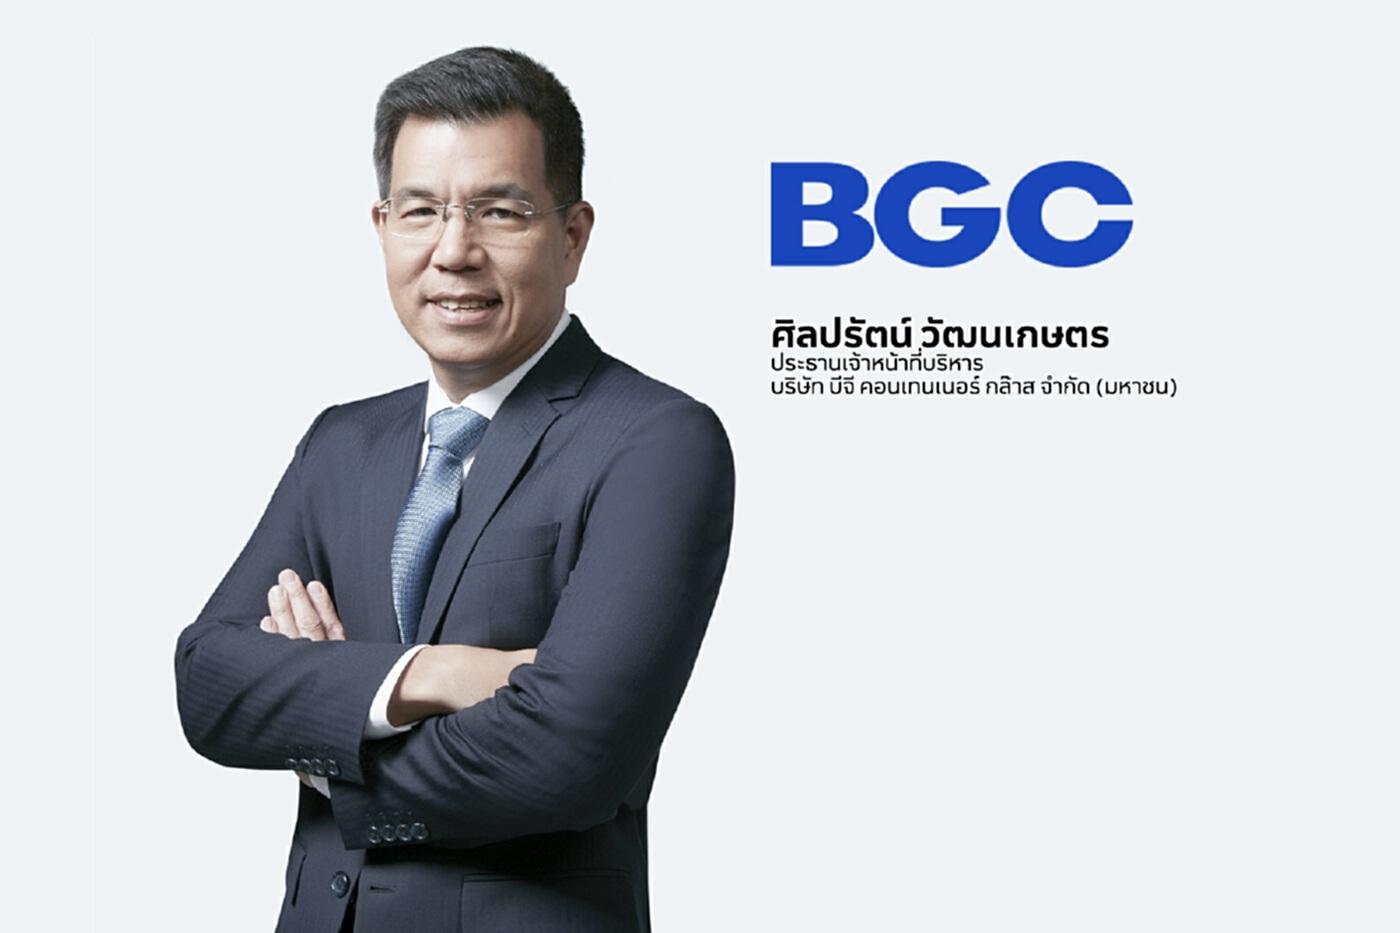 BGC รับอานิสงส์เปิดประเทศ ดันดีมานด์บรรจุภัณฑ์แก้วโต หนุนรายได้ไตรมาส4/64